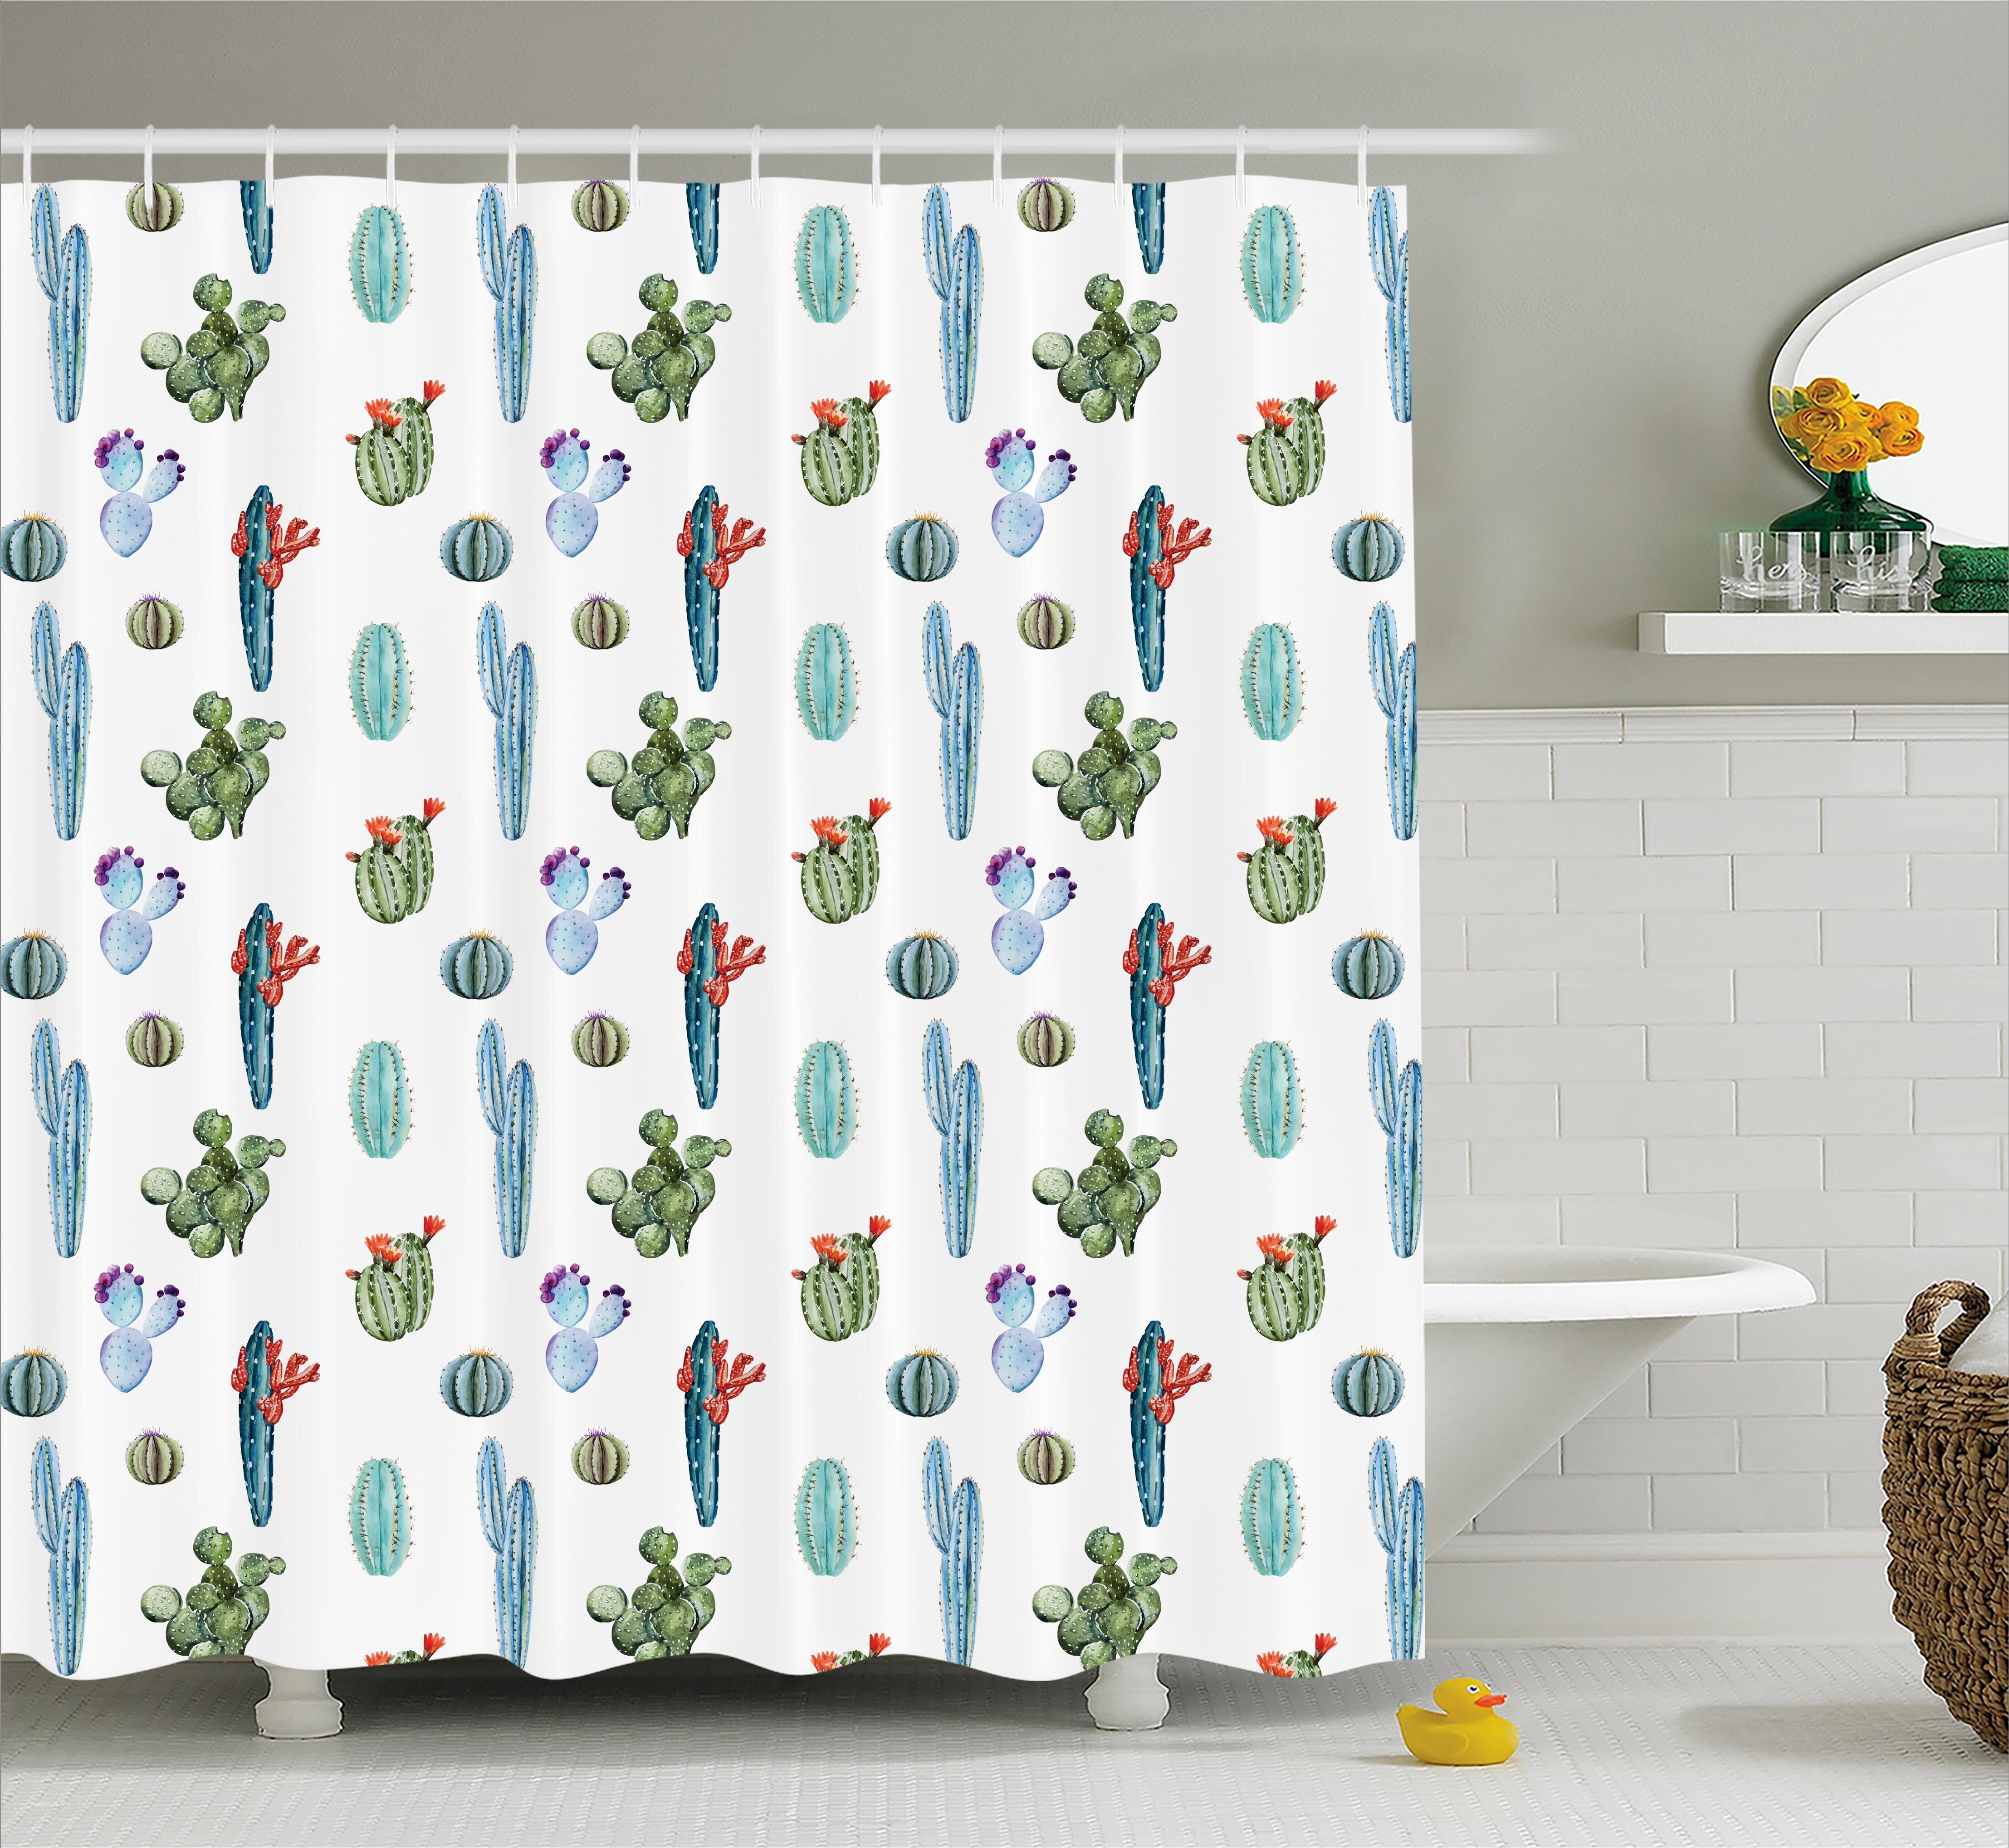 ebern designs zendaya watercolor cactus plant image desert hot mexican souh nature floral print single shower curtain wayfair